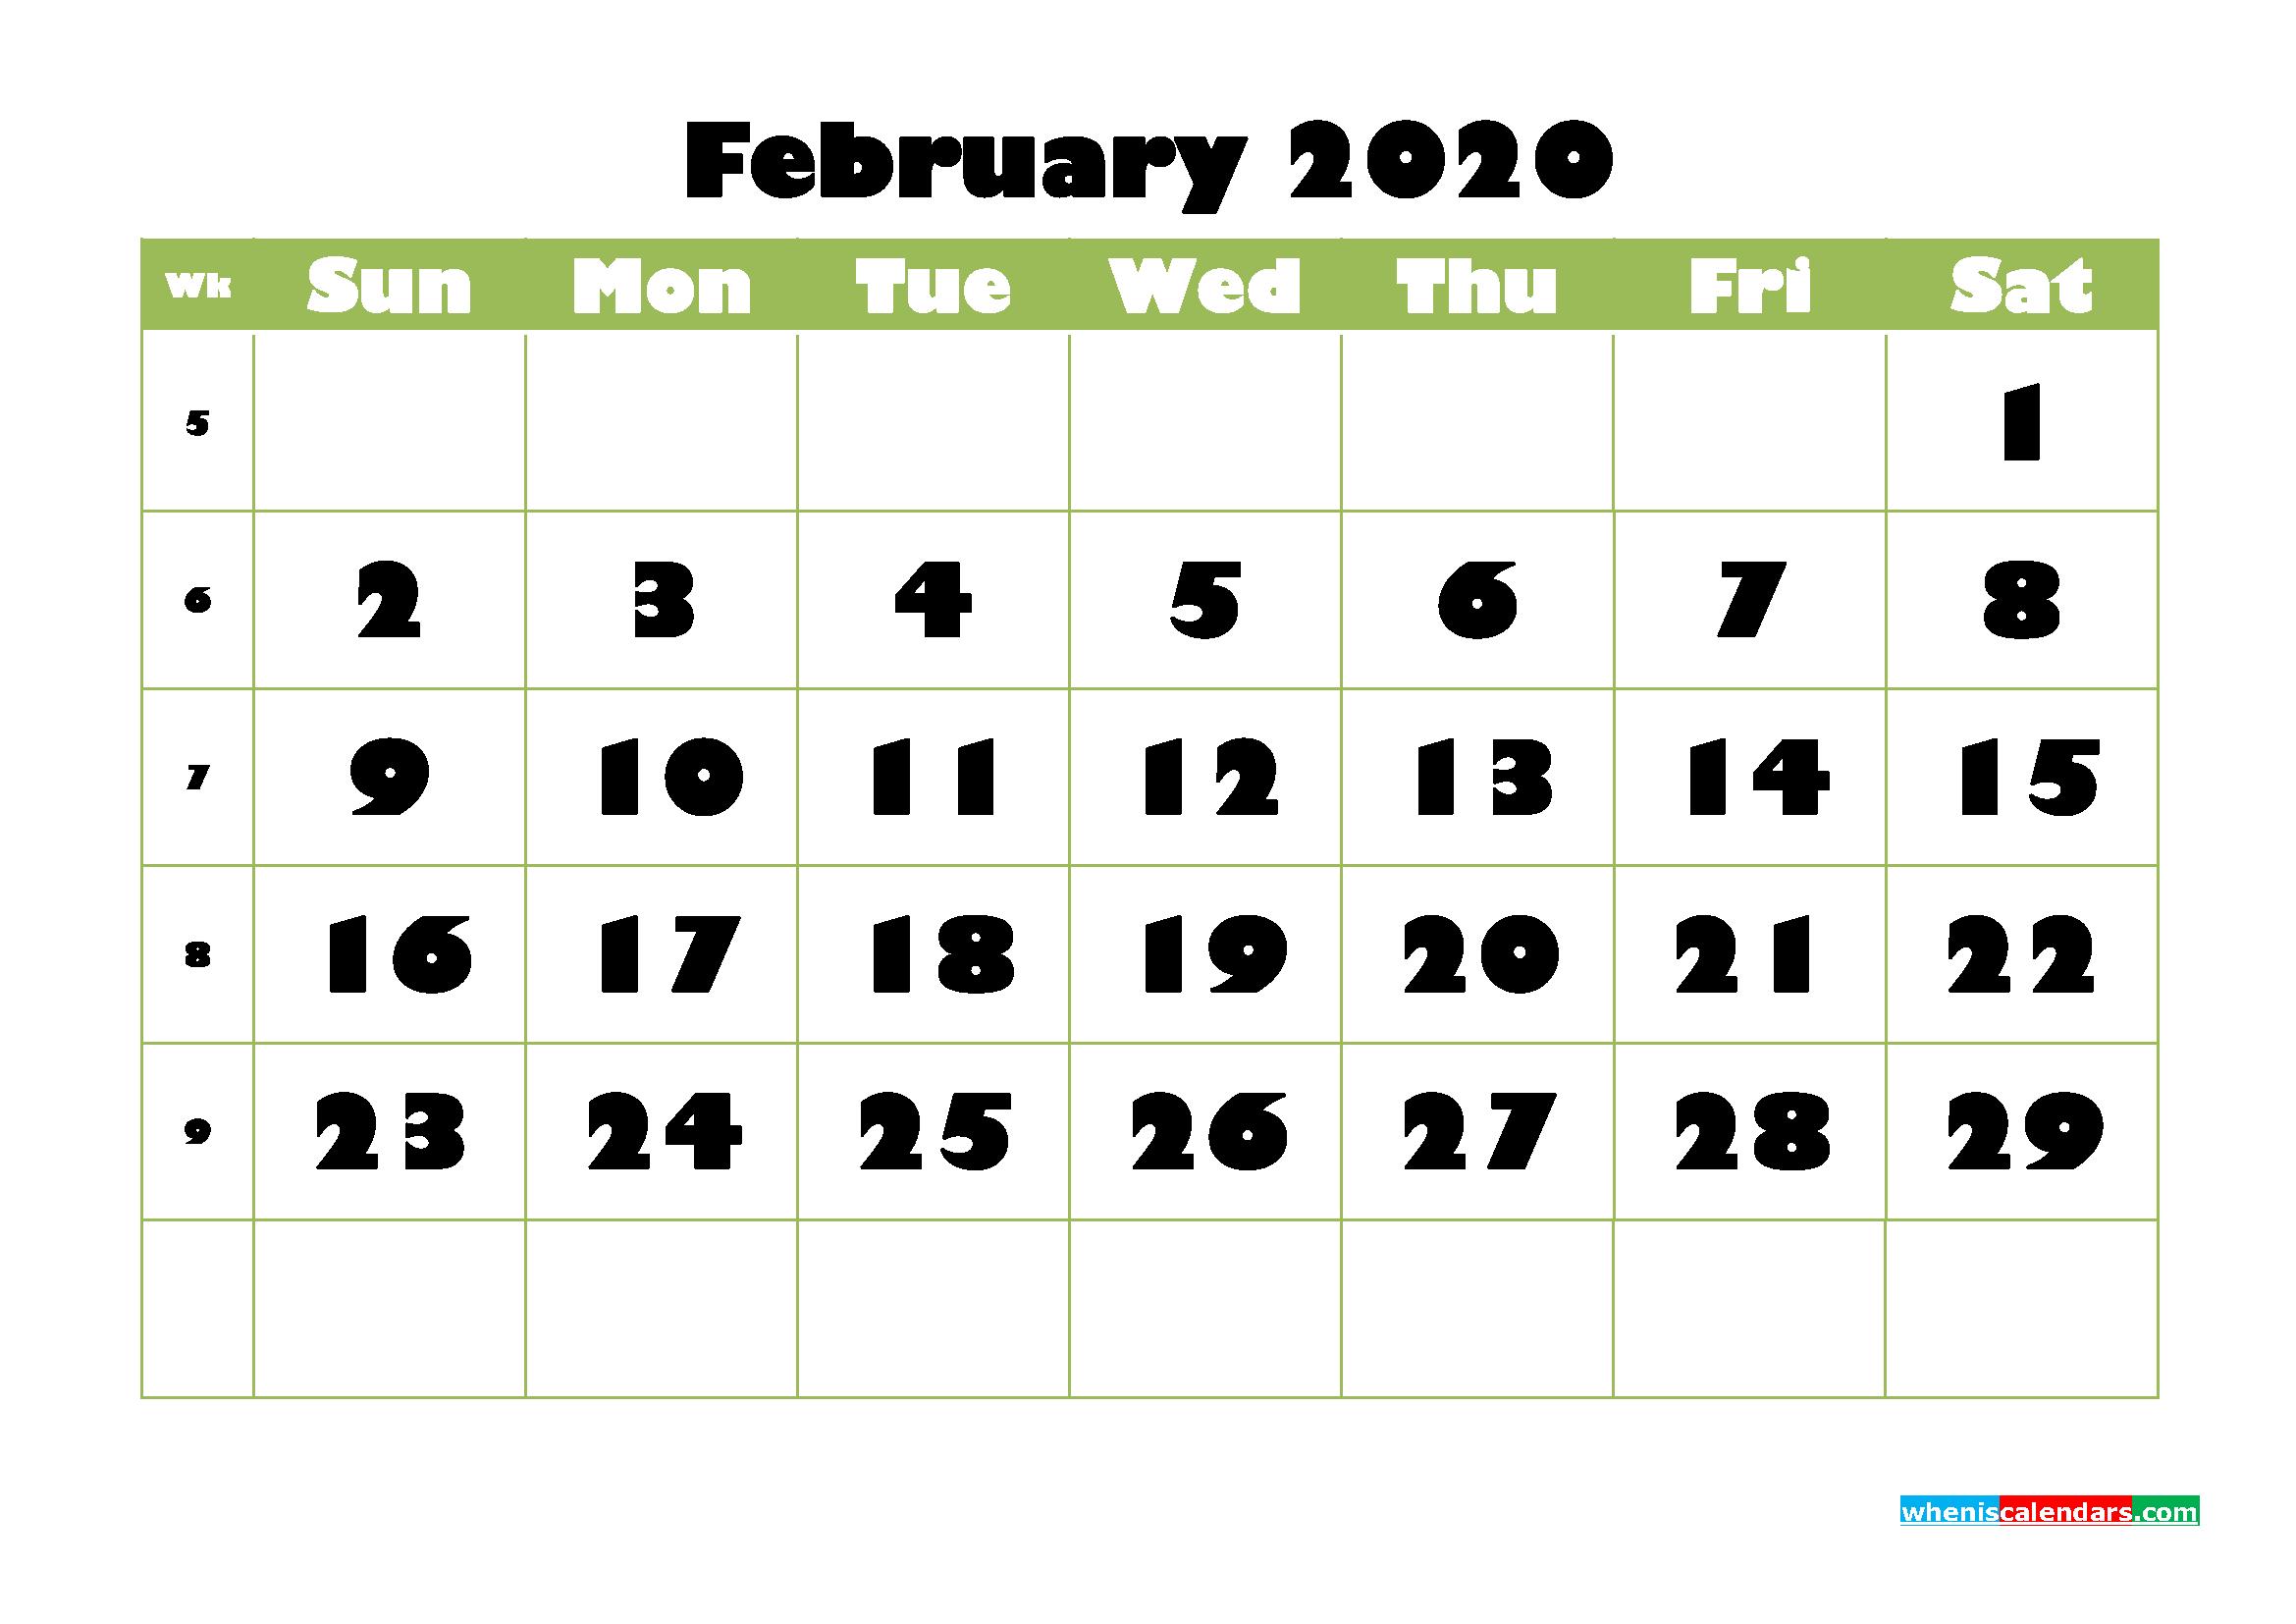 February Printable Calendar 2020 PDF, Word - No.m20b734